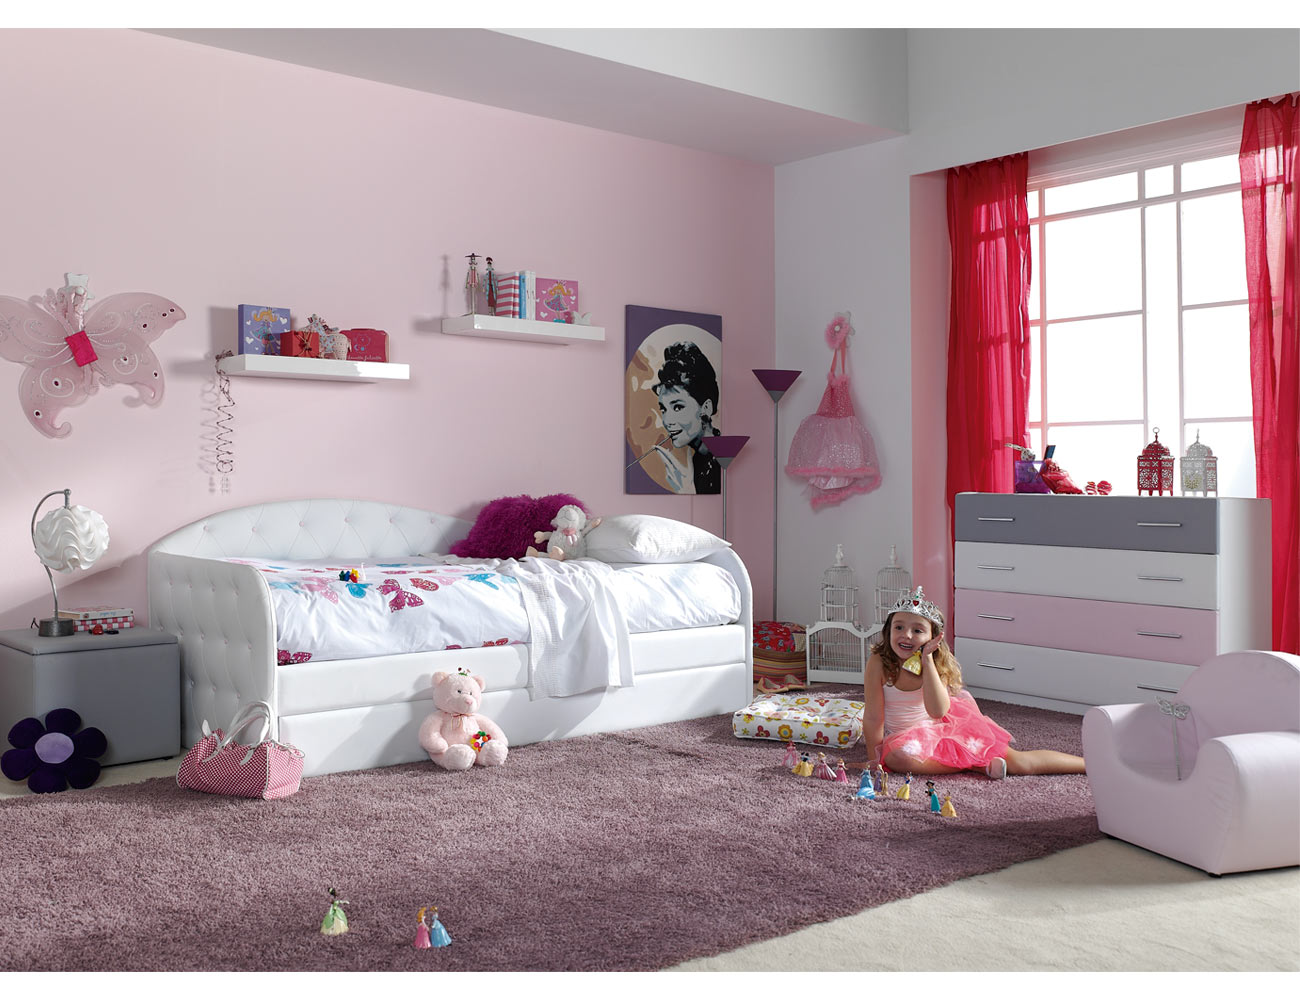 243 cama nido11